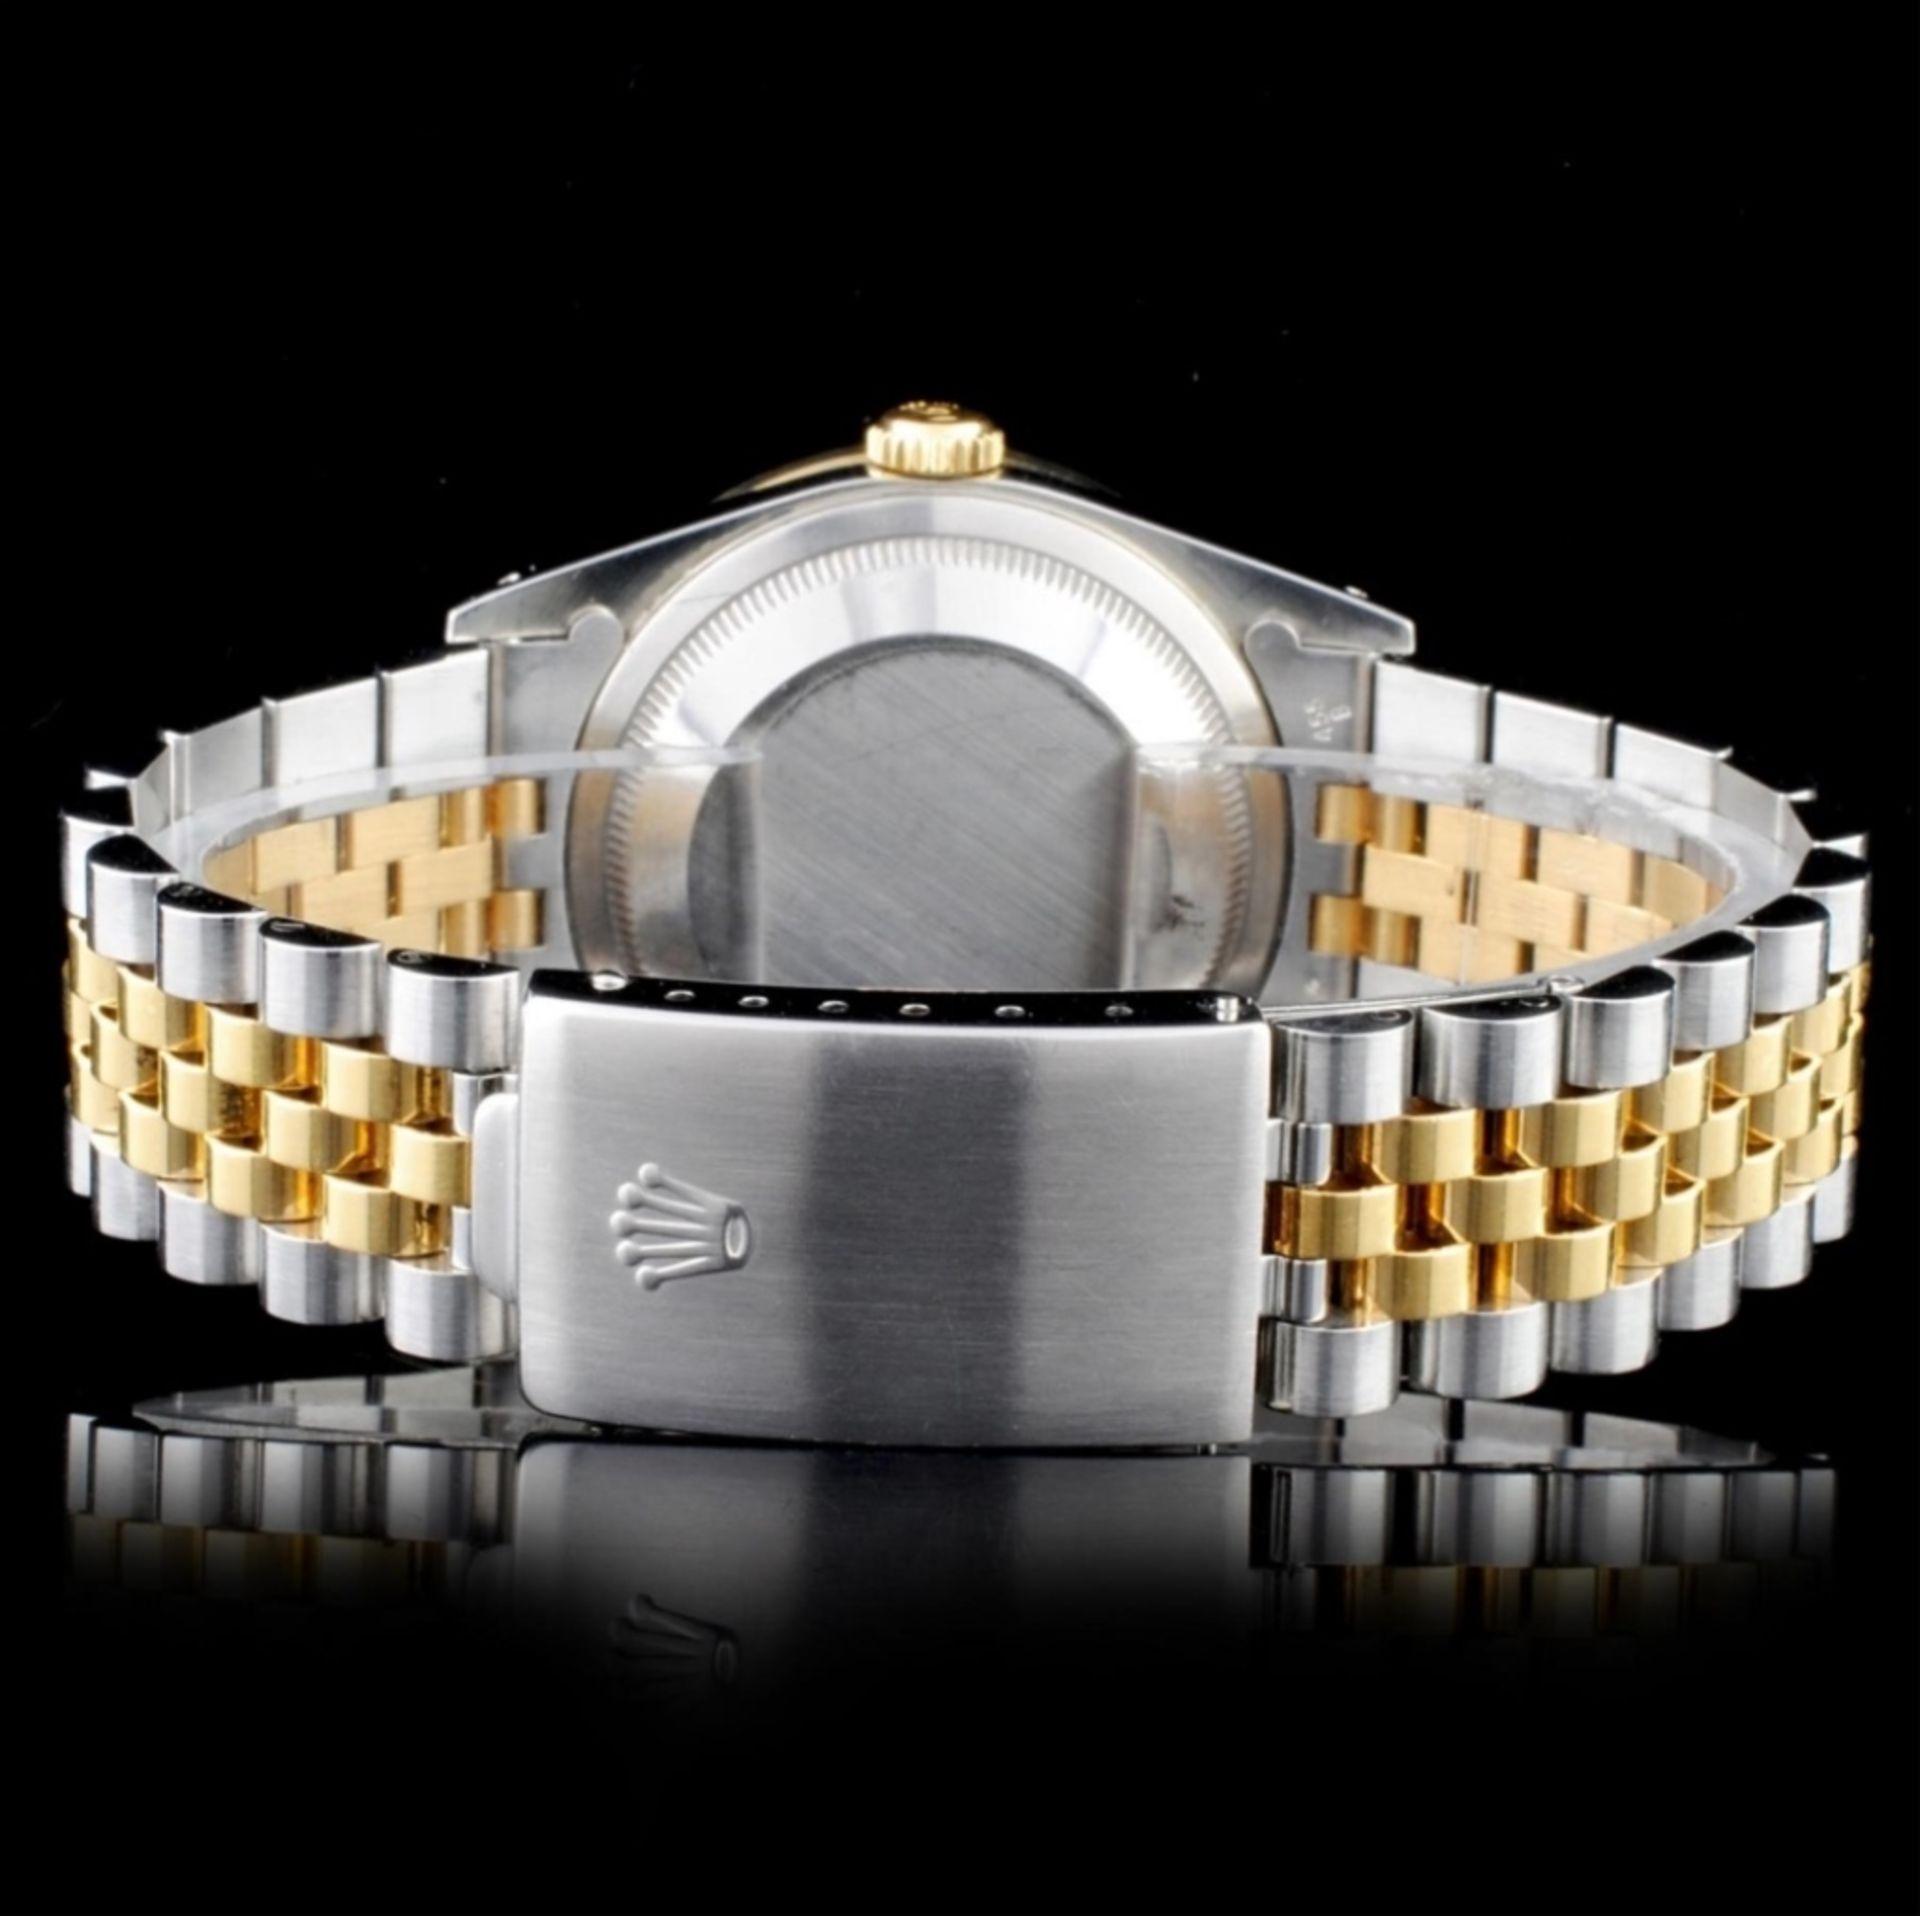 Rolex YG/SS DateJust Diamond 36MM Watch - Image 3 of 5